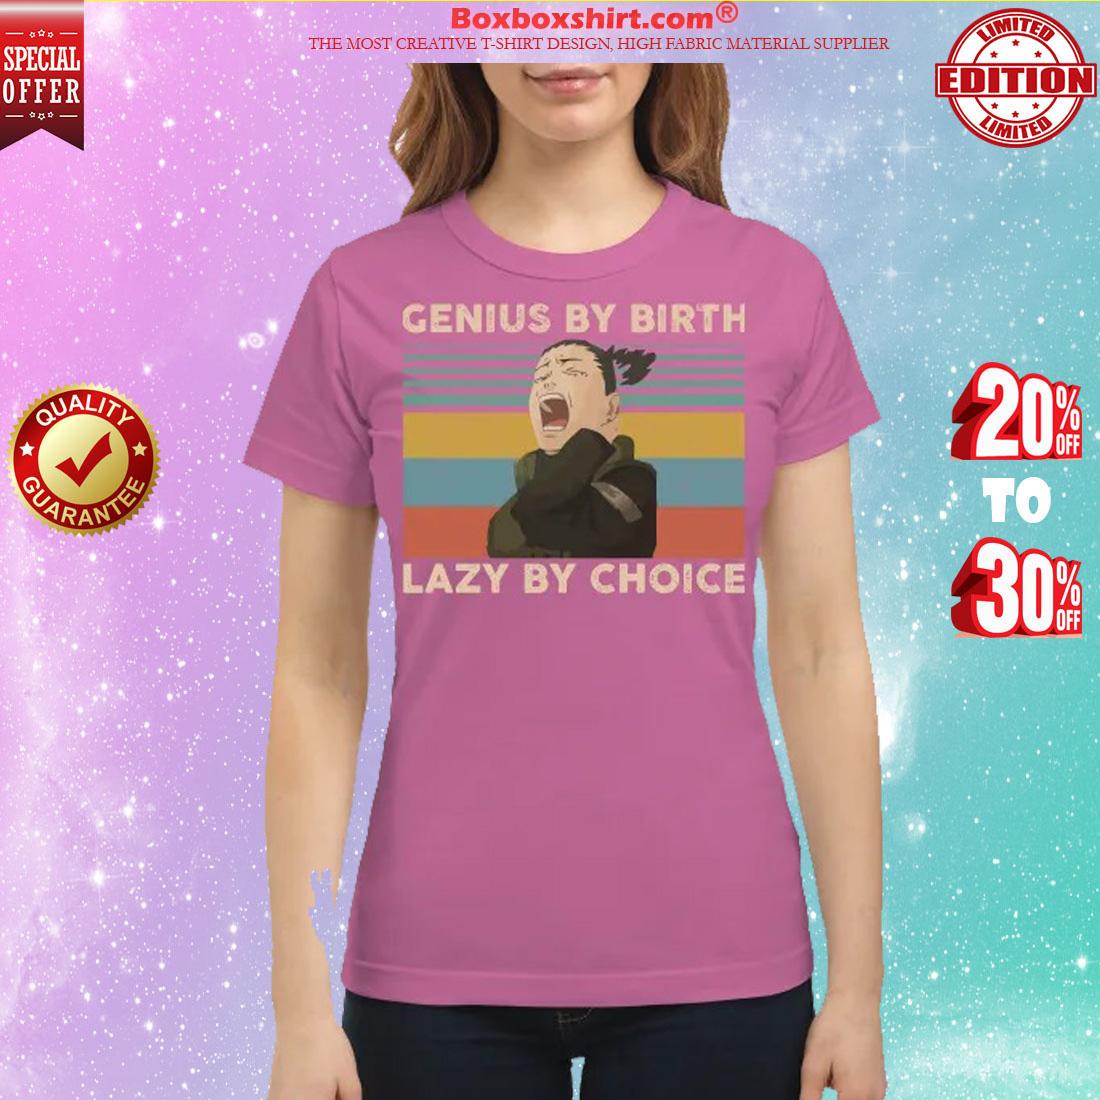 Genius by birth lazy by choice classic shirt